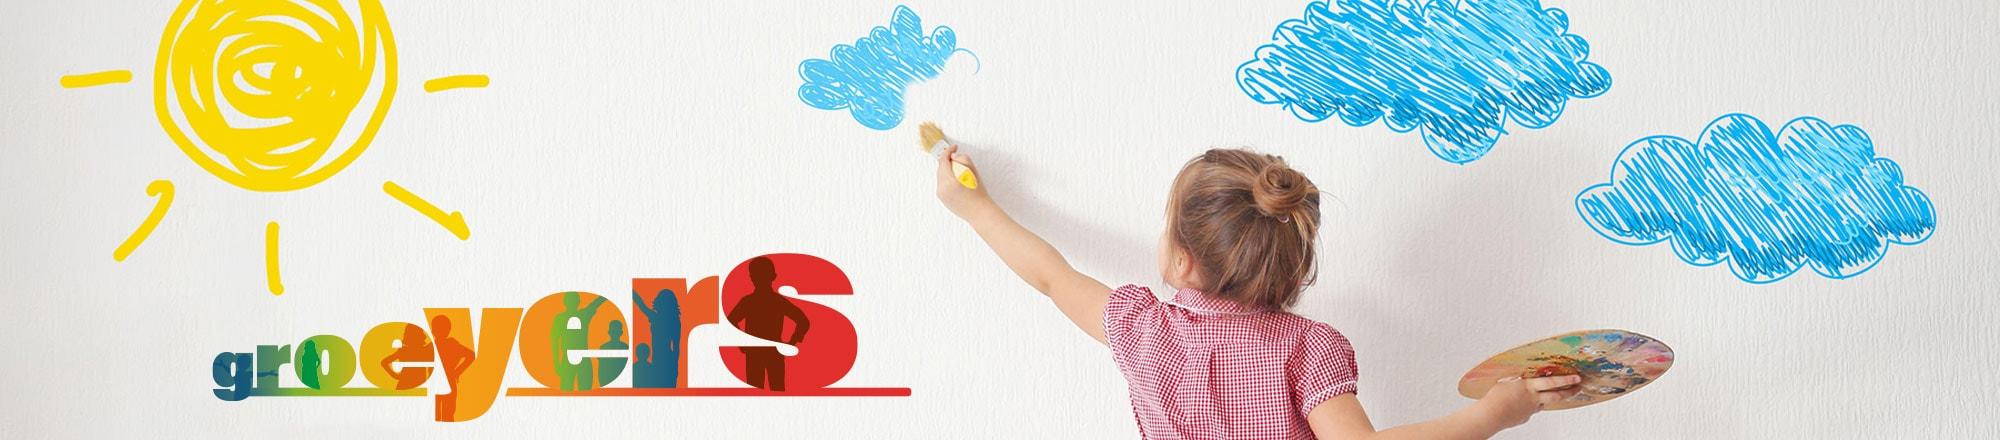 Kinderopvang voor zorgmedewerkers